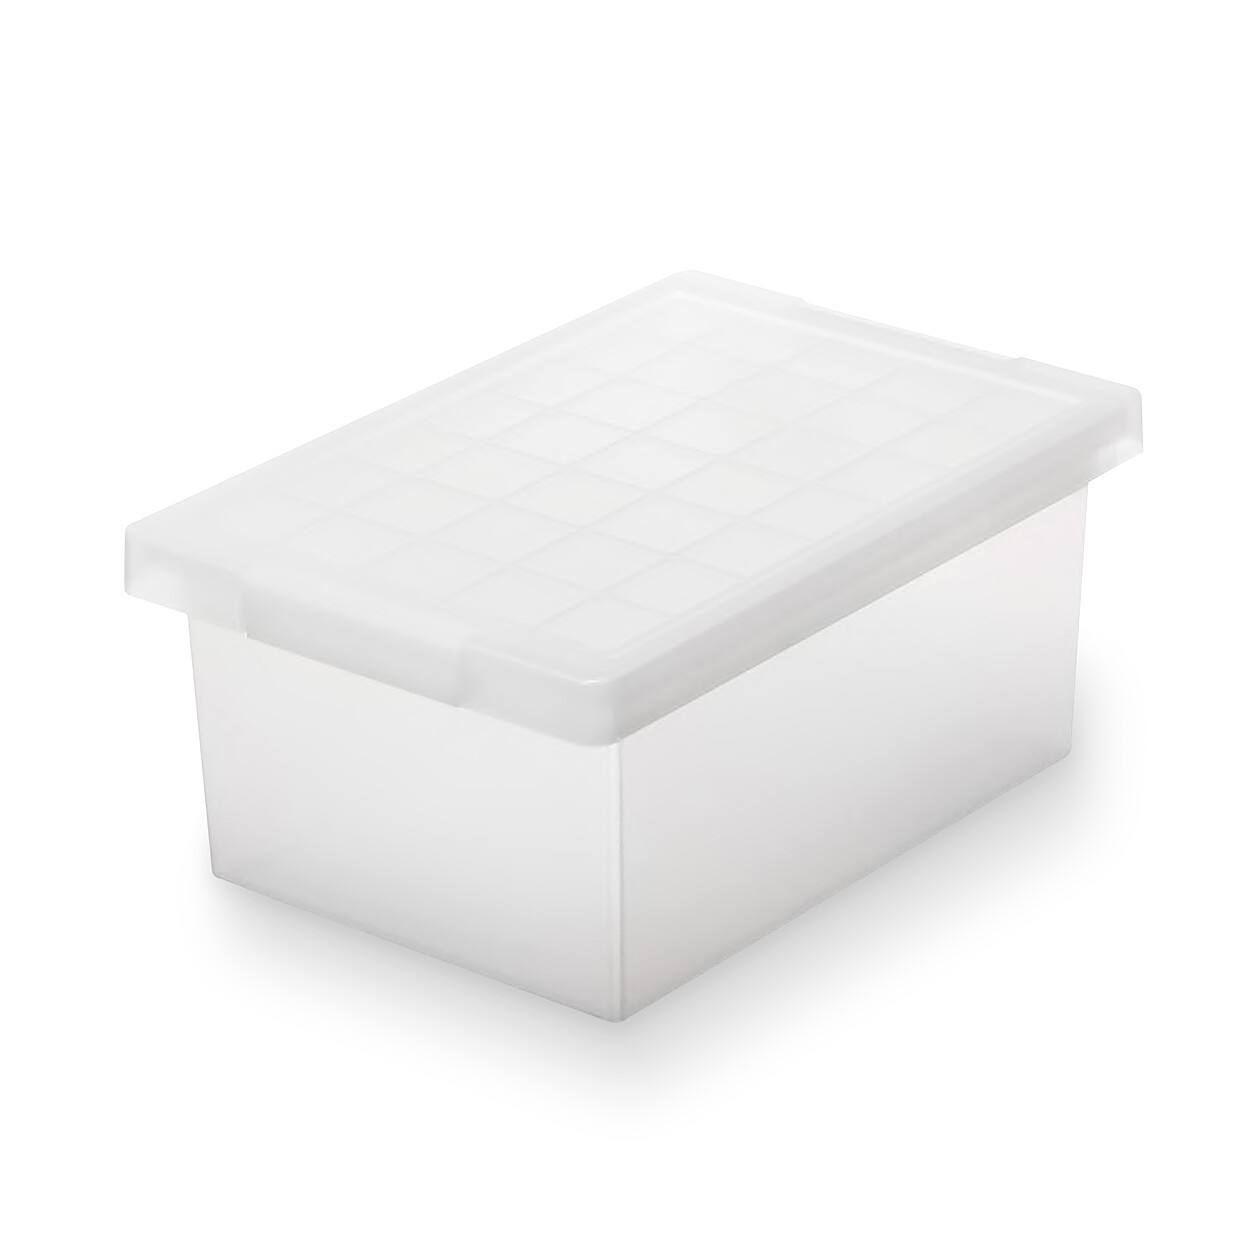 RoomClip商品情報 - ポリプロピレンキャリーボックス・ロック付・小